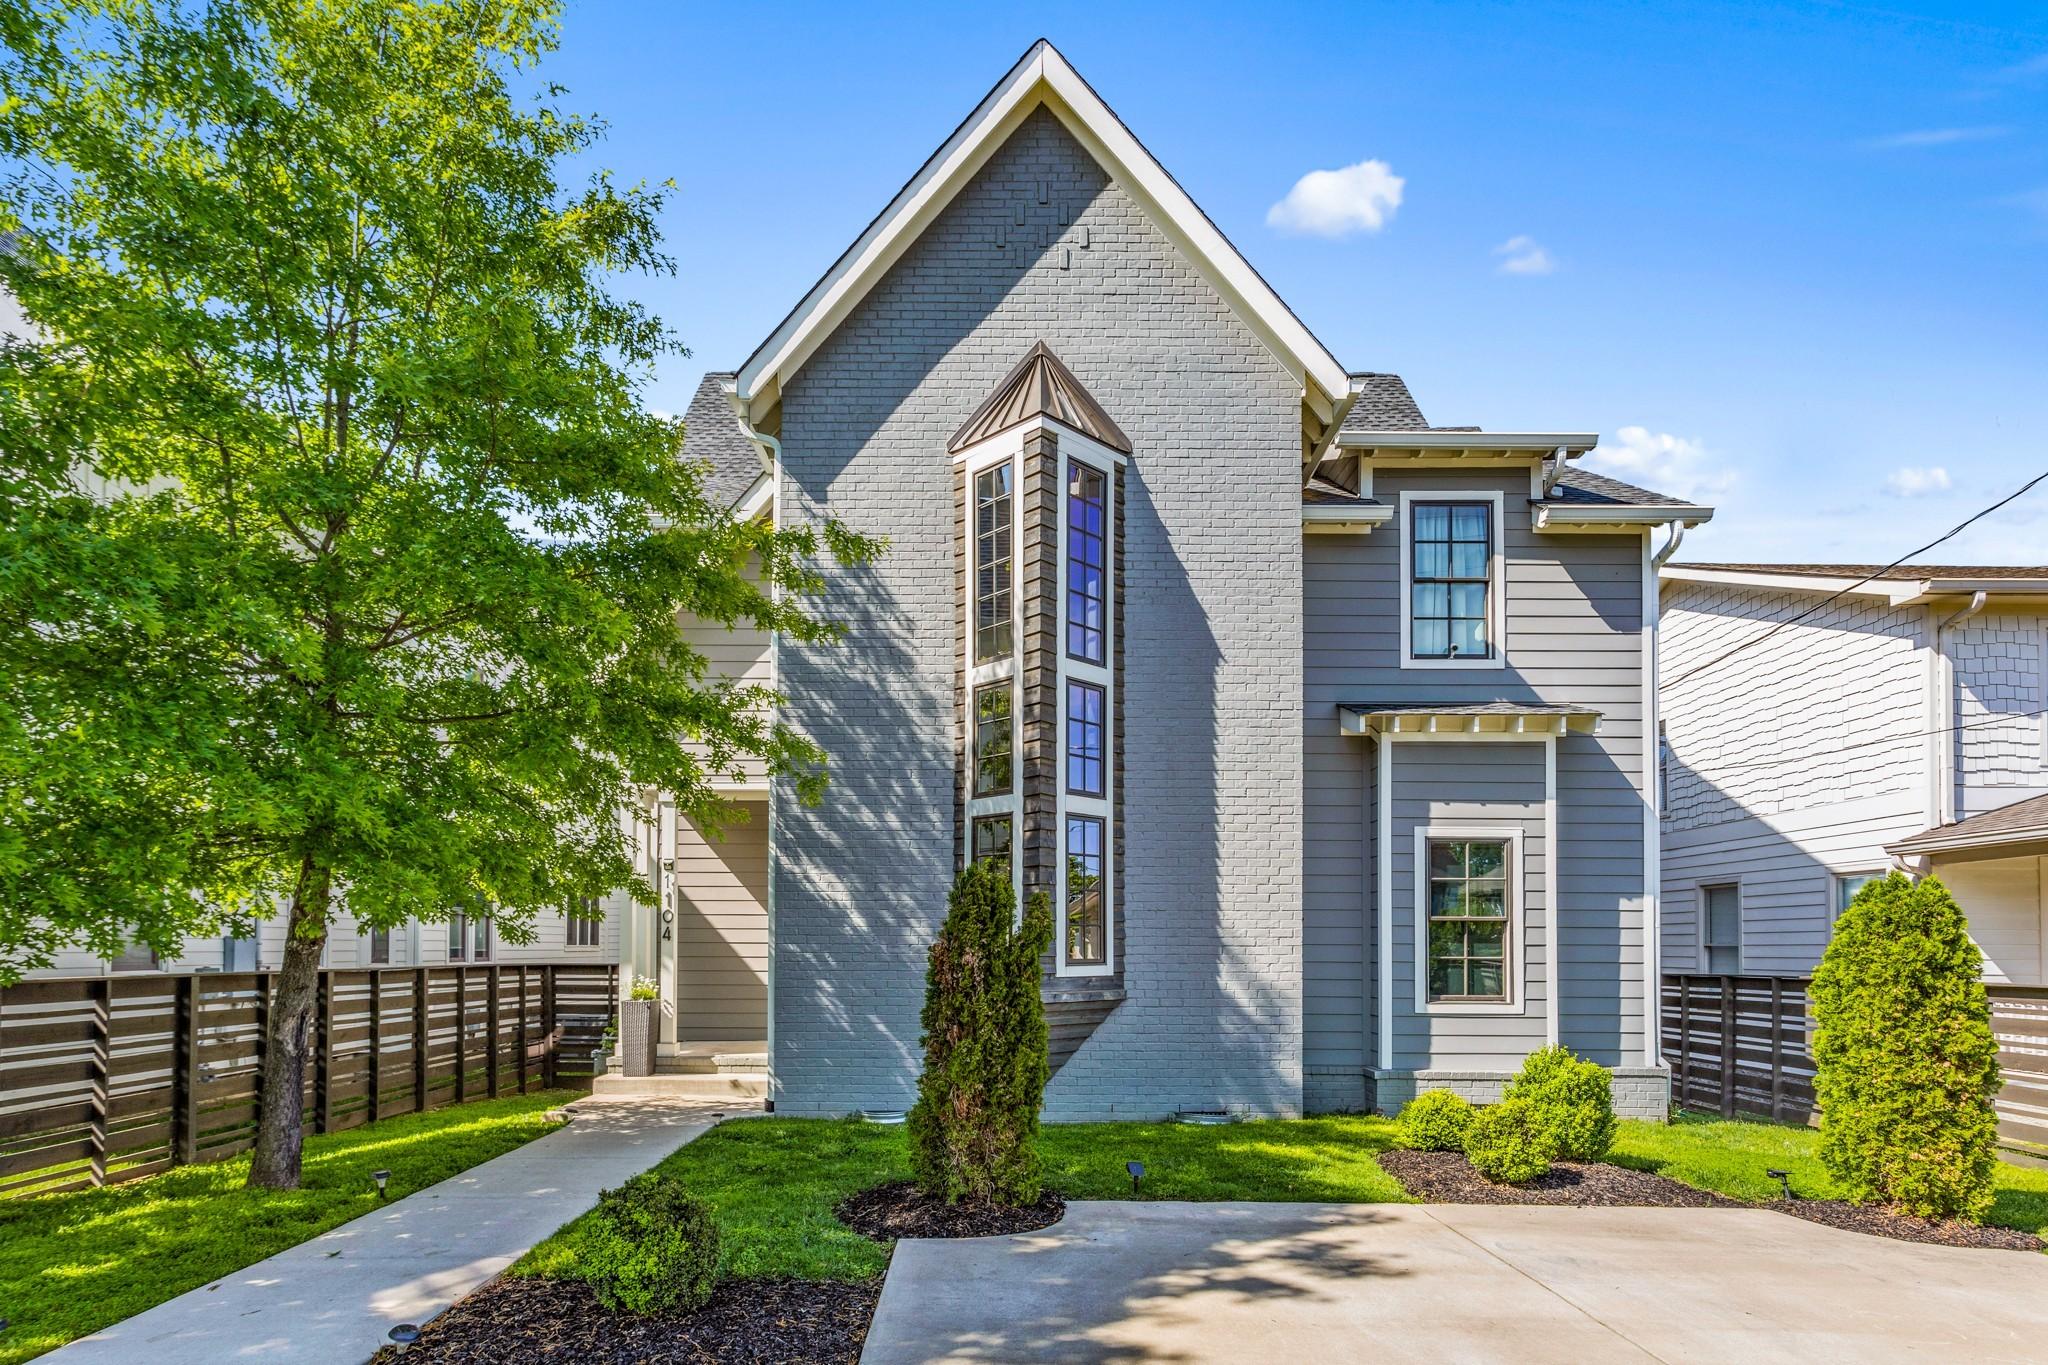 1104 Caldwell Ave Property Photo - Nashville, TN real estate listing